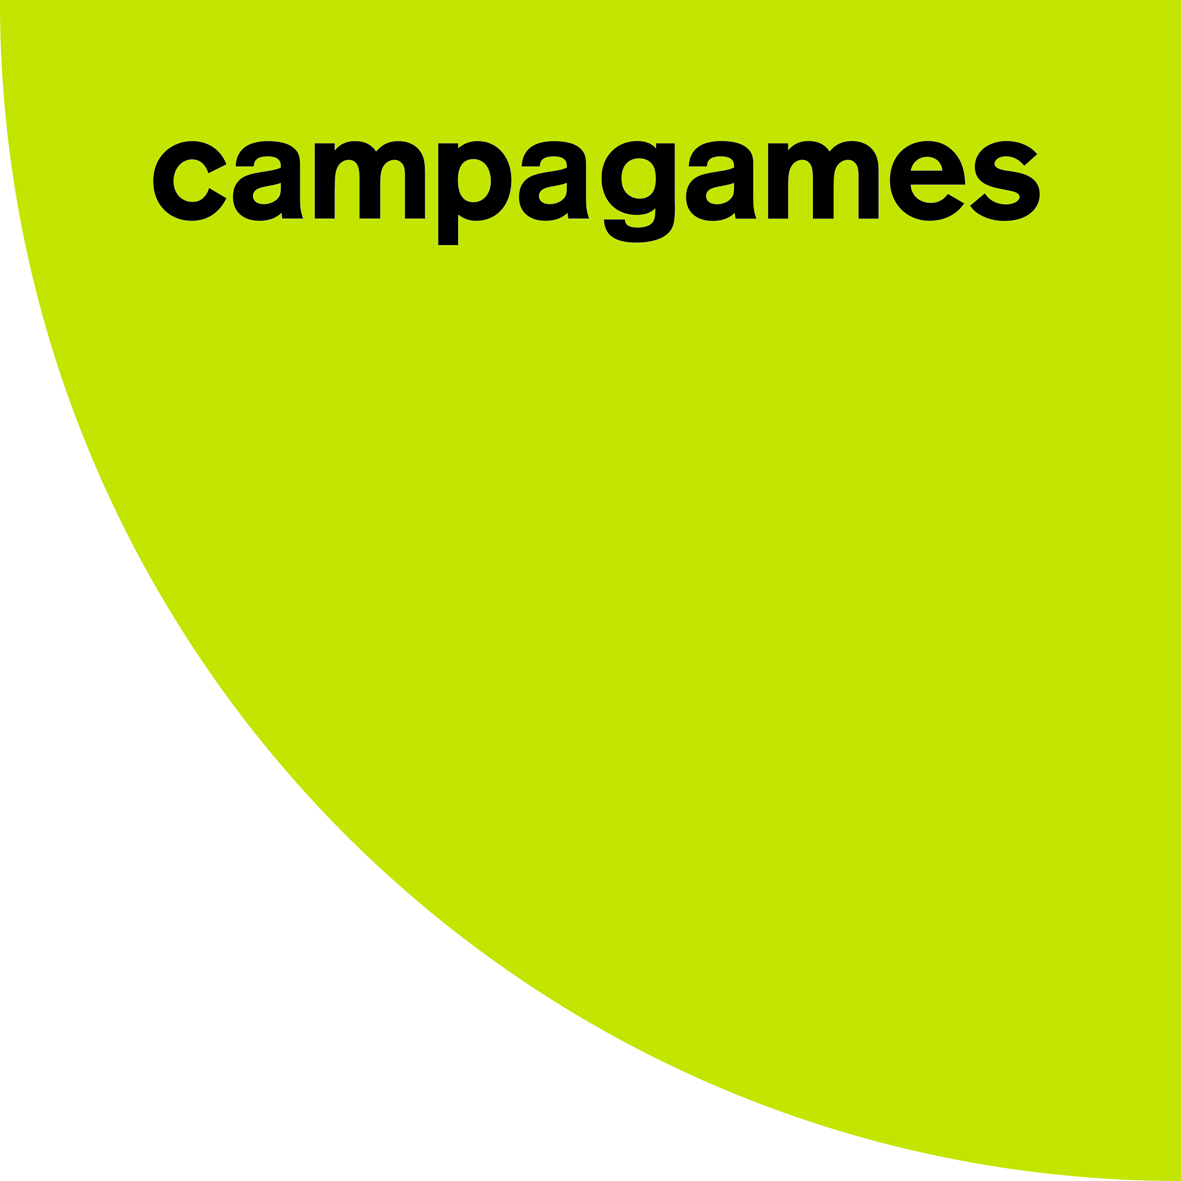 campagames-Logo_Ecke_#4701C